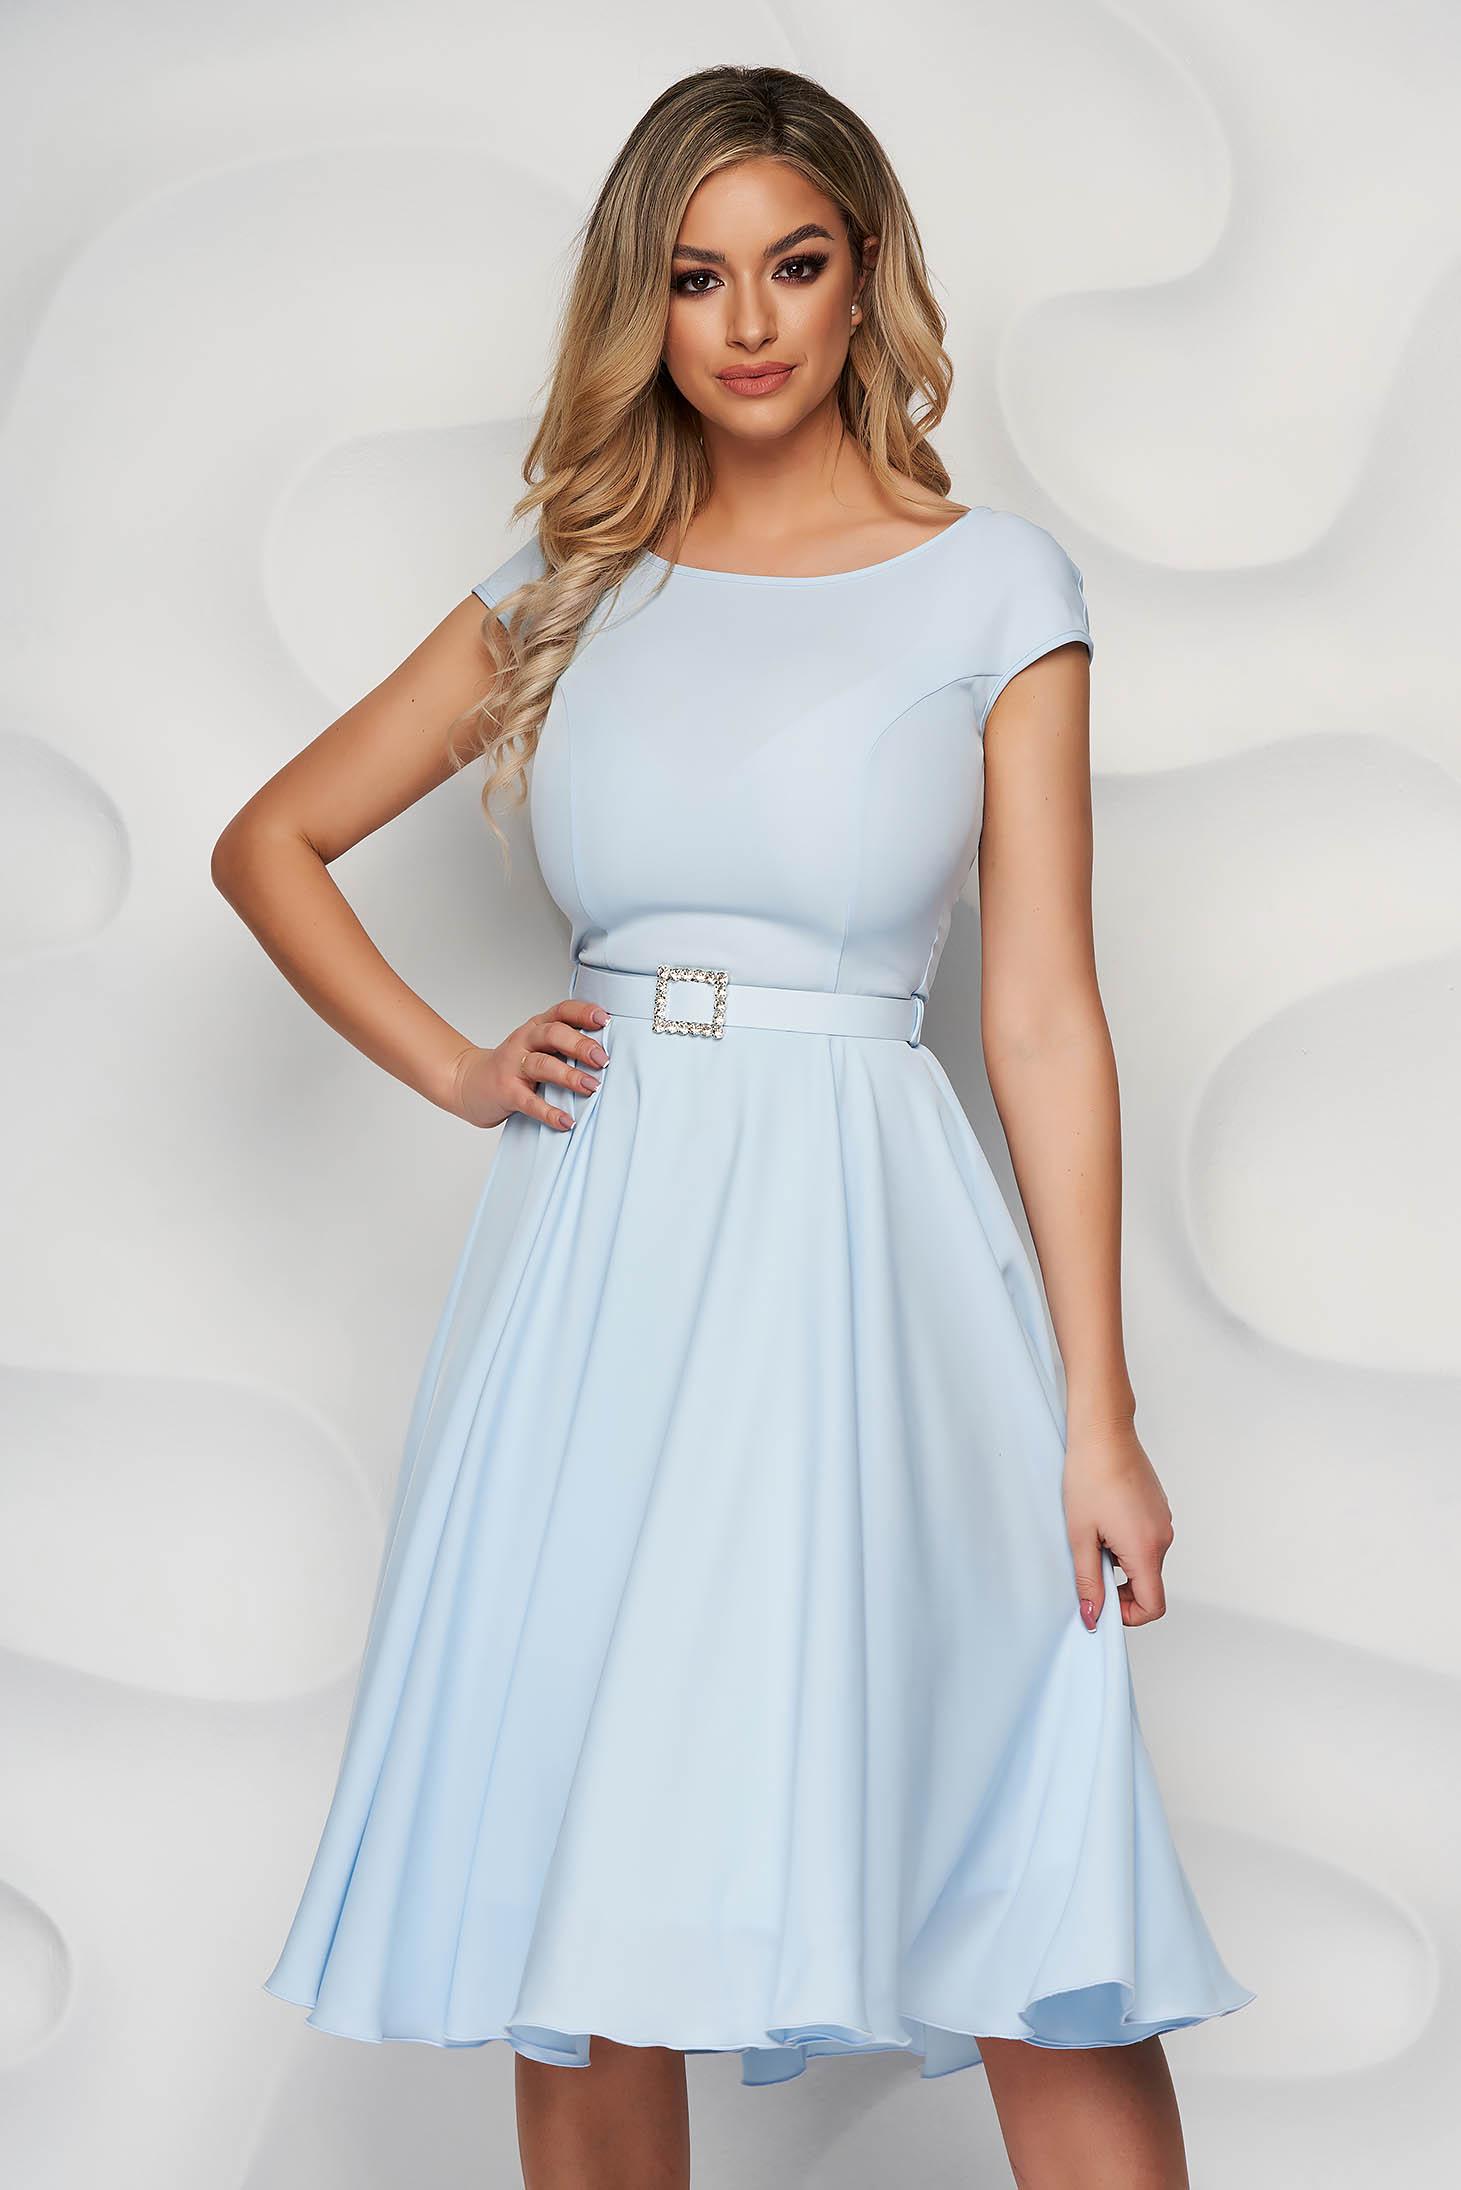 StarShinerS lightblue dress elegant midi cloth accessorized with a waistband